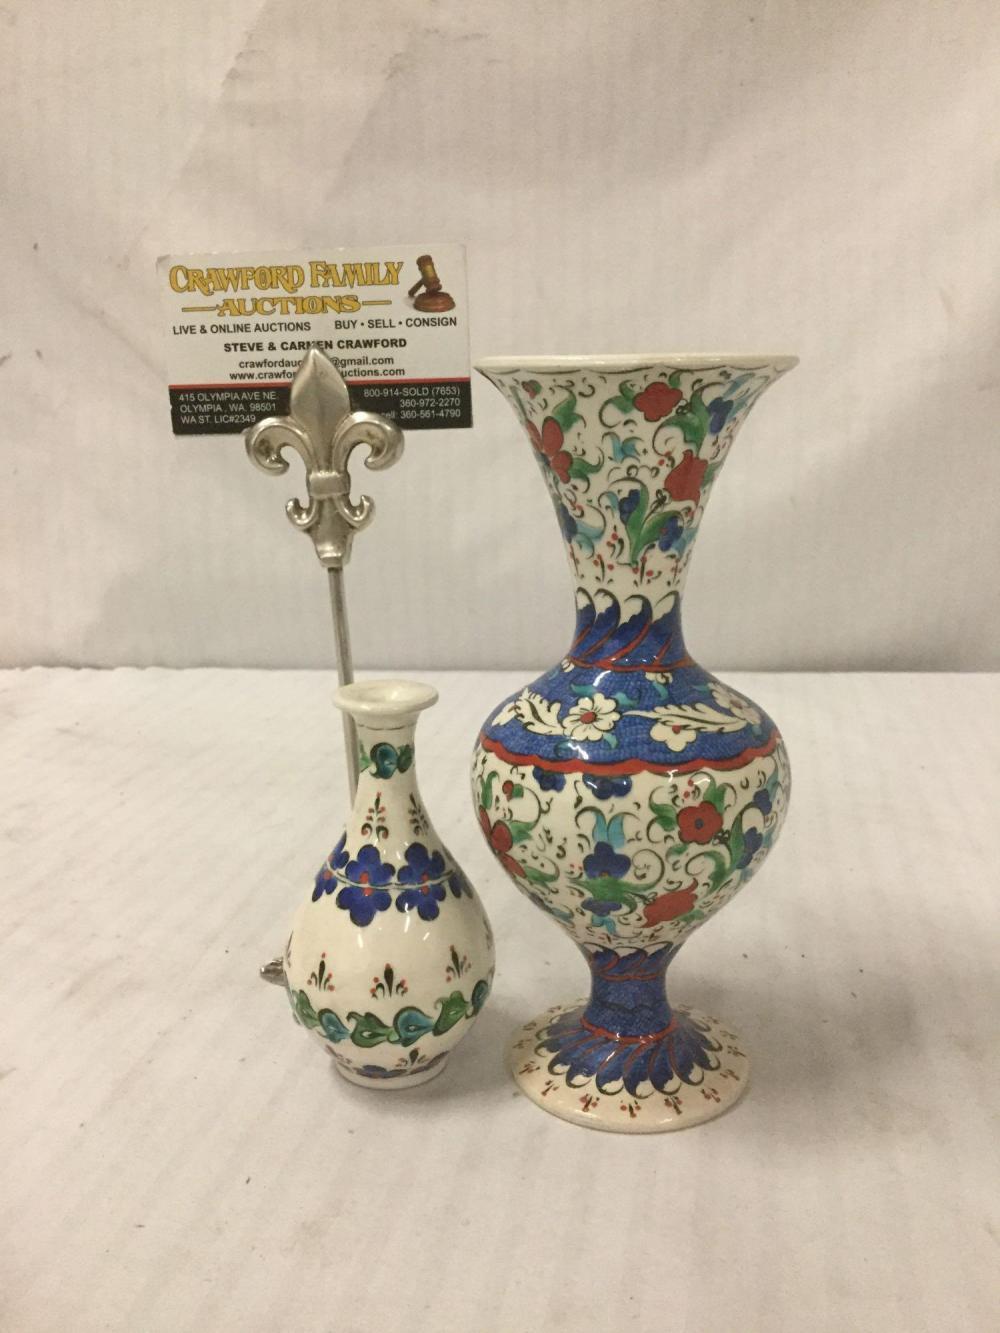 Lot 297: 2 hand painted flower print vases - artist signed on the bottom